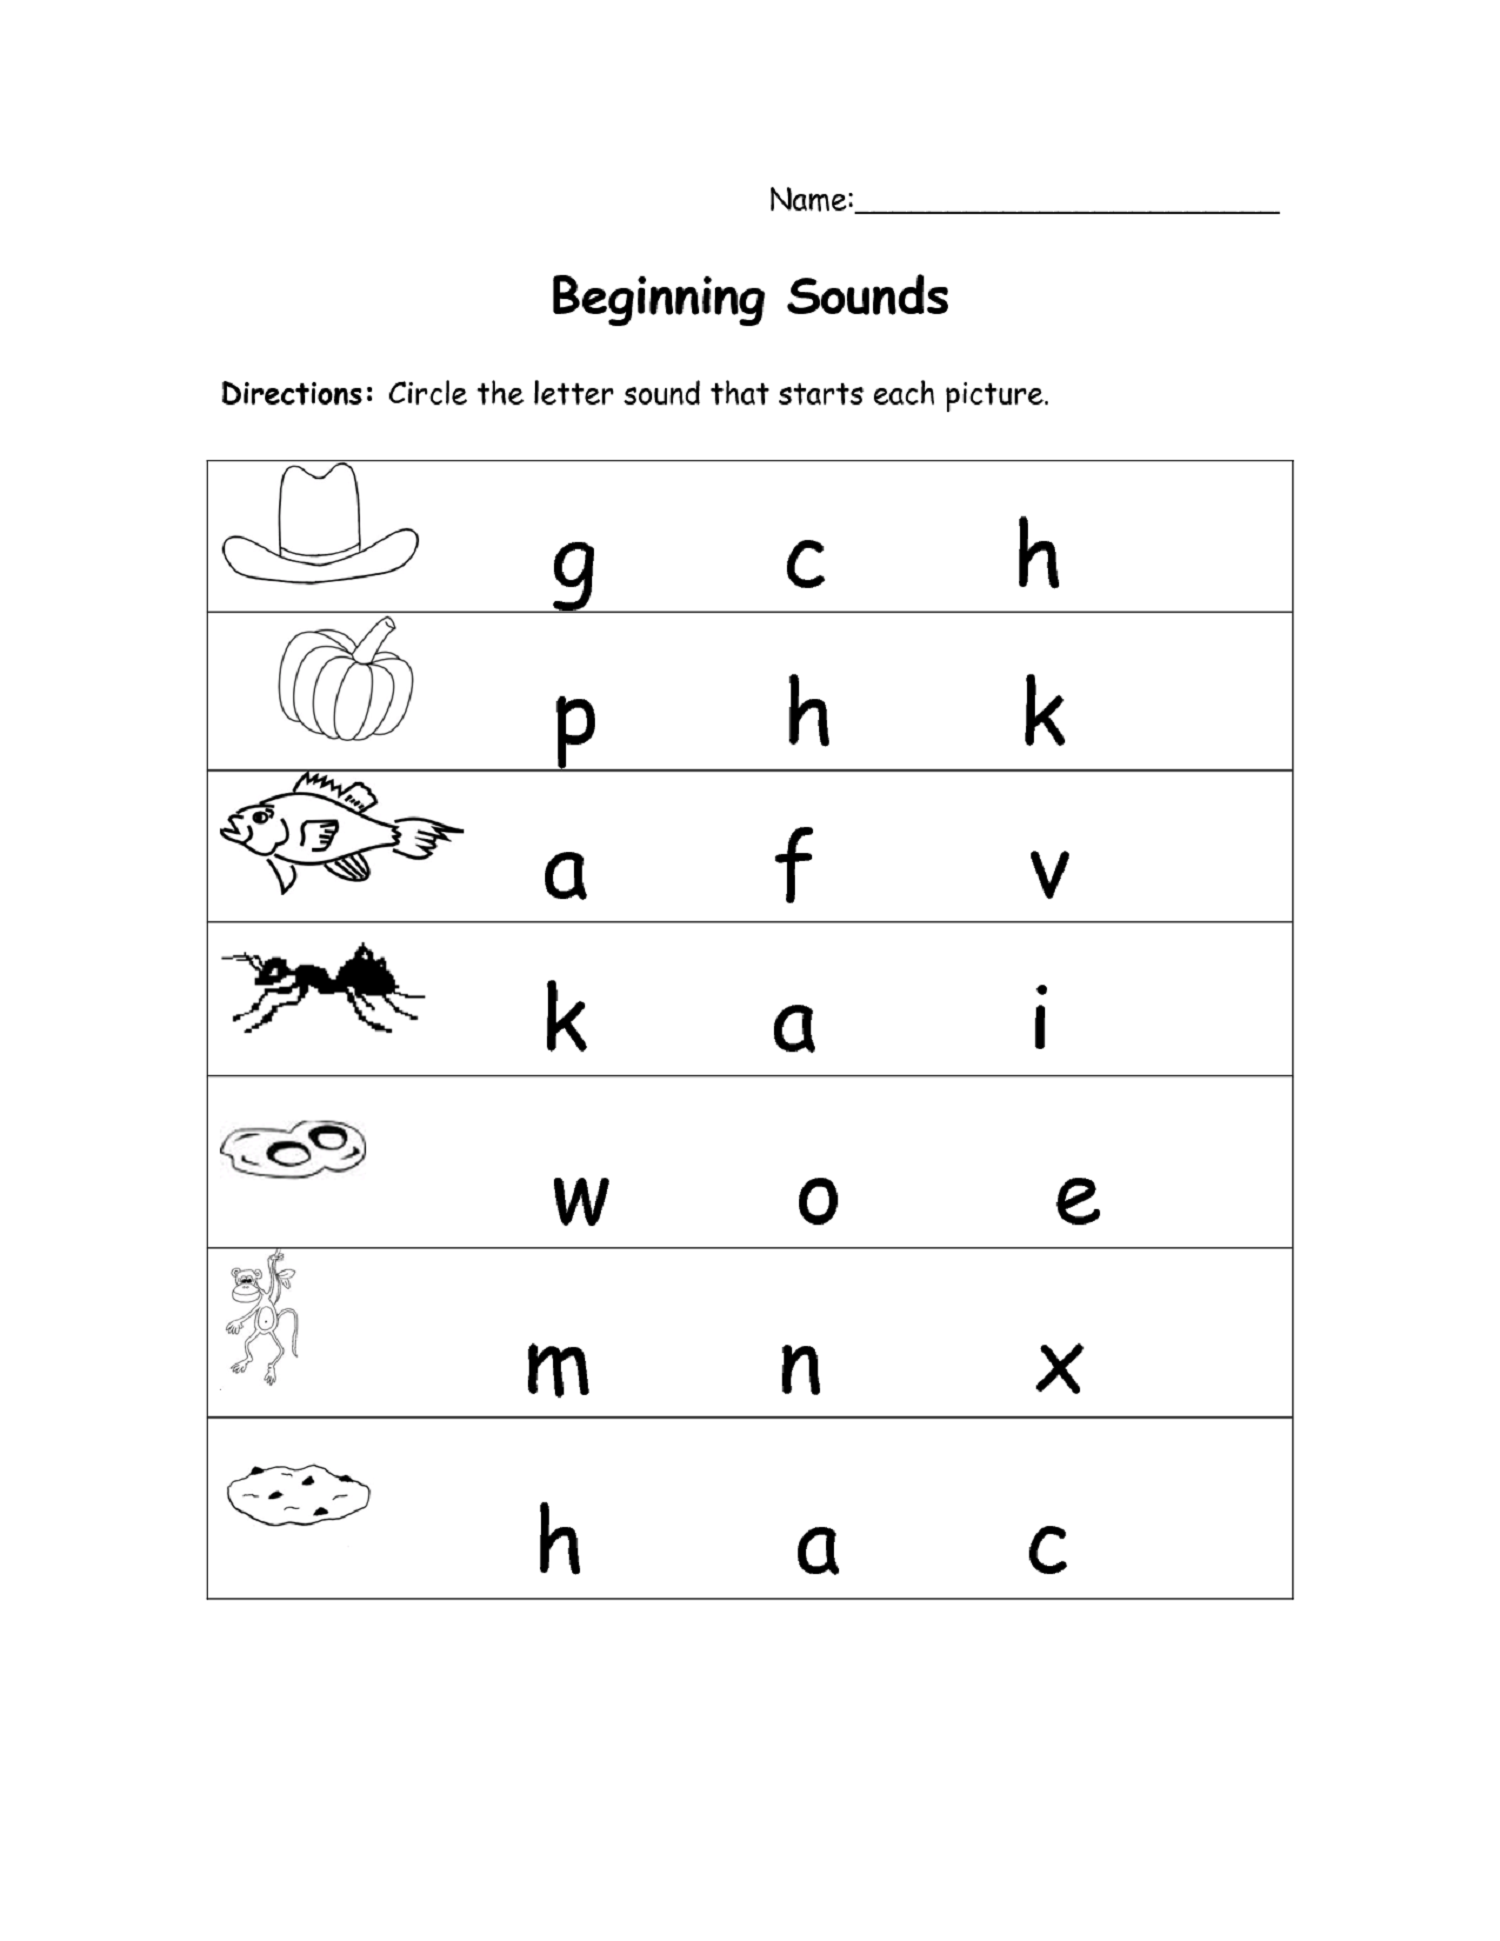 Worksheets Initial Sound Worksheets kindergarten alphabet worksheets for children learning dear joya letter sound activitiespreschool lettersinitial